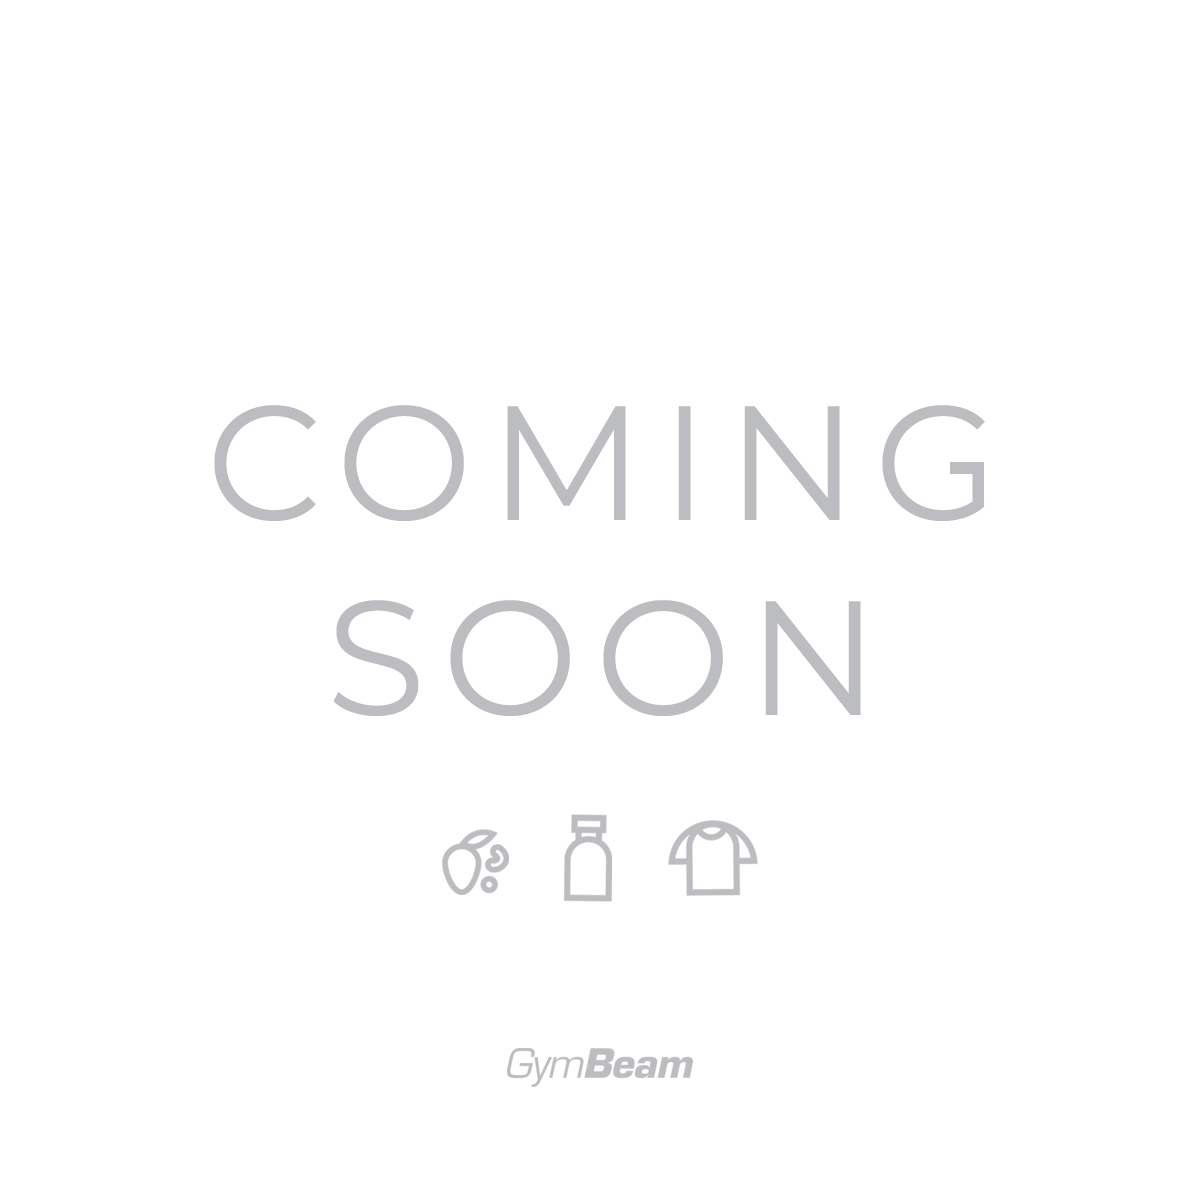 Mutant Madness - PVL - titulná fotka